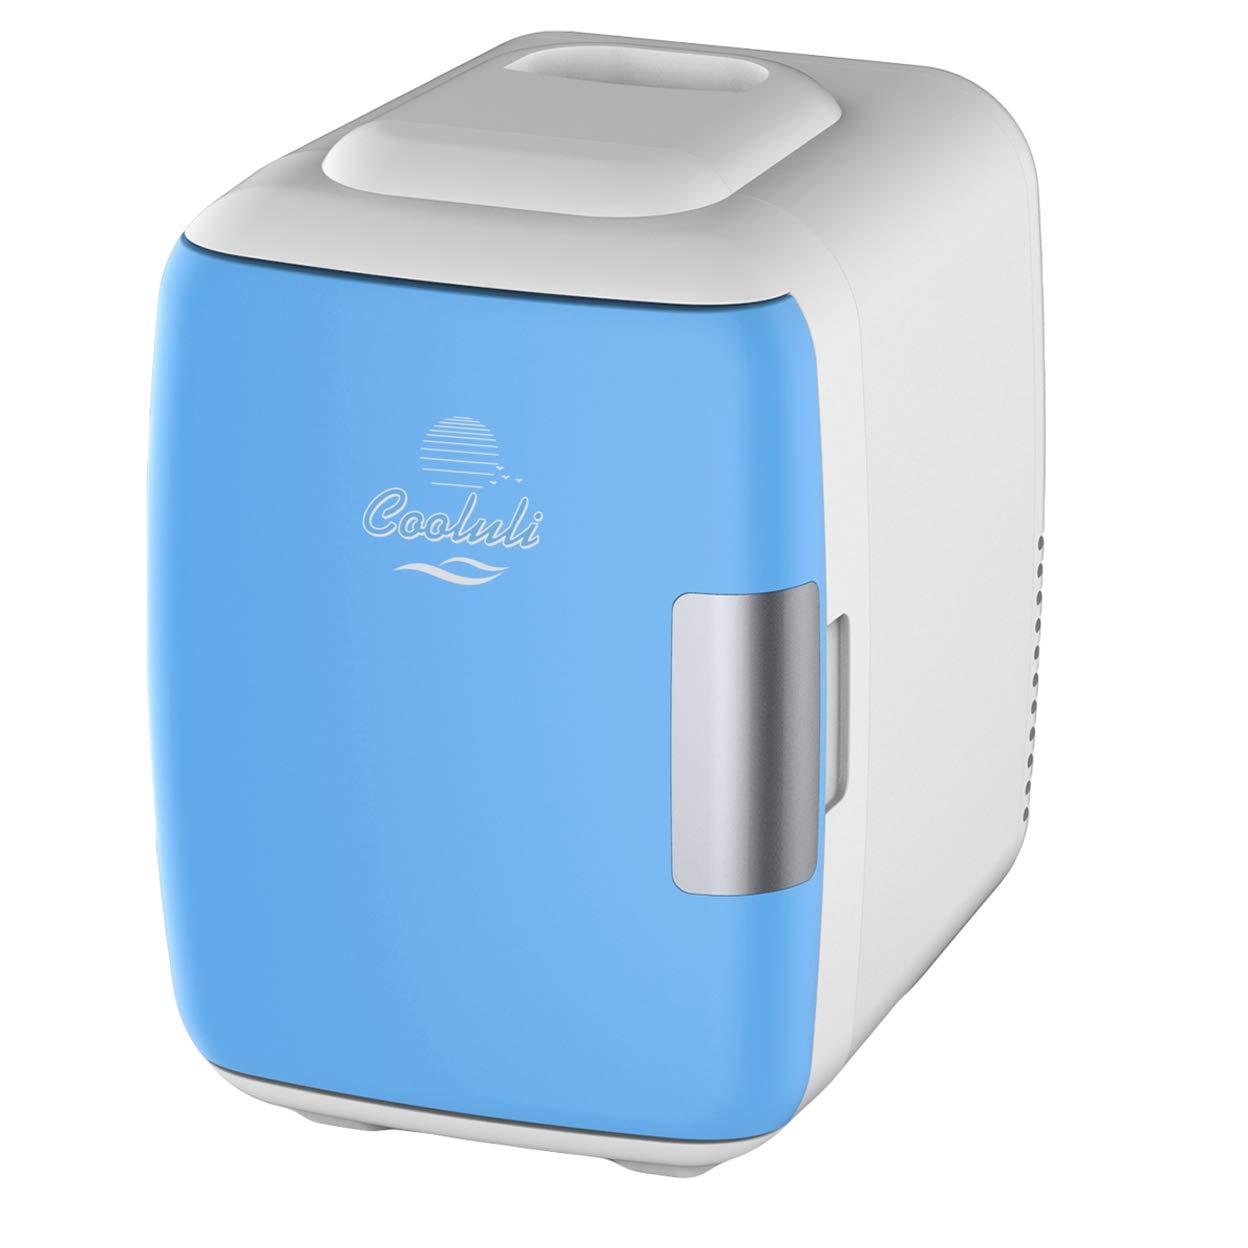 Cooluli - Mini Fridge Electric Cooler and Warmer